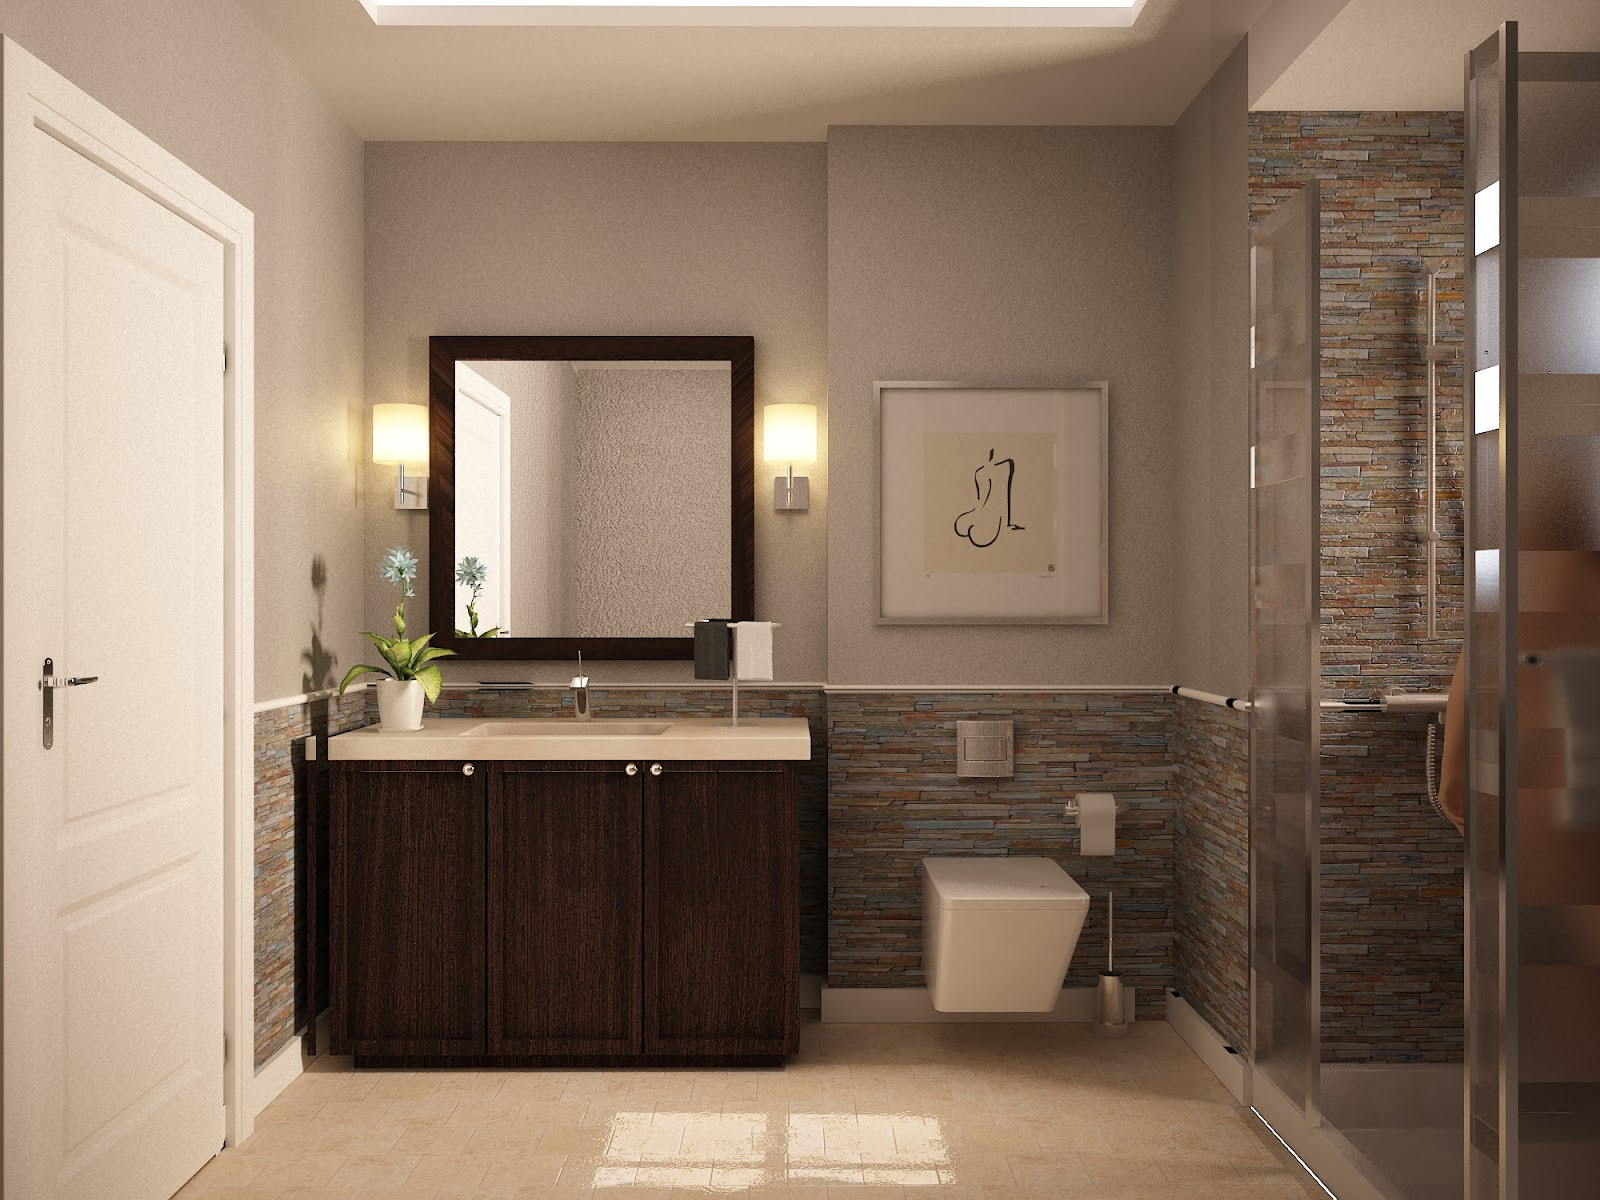 Small Bathroom Paint Colors  19 Popular Paint Colors for Bathroom Dap fice